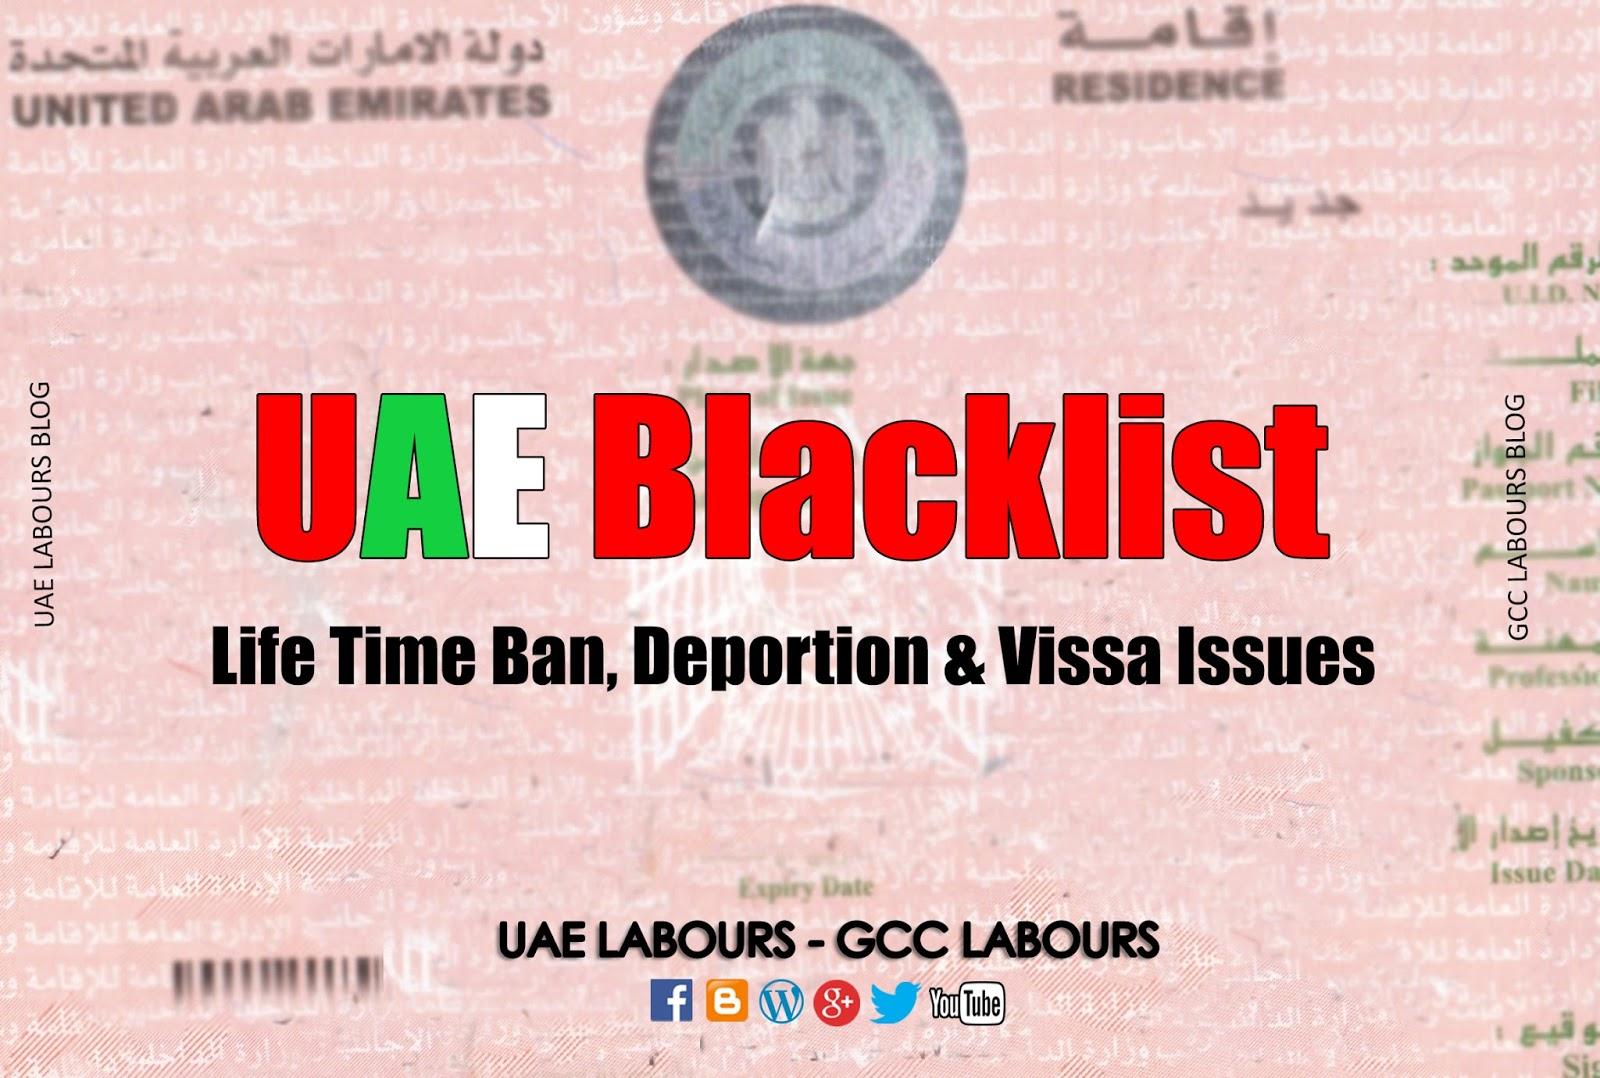 UAE Blacklist and Lifetime ban - UAE LABOURS